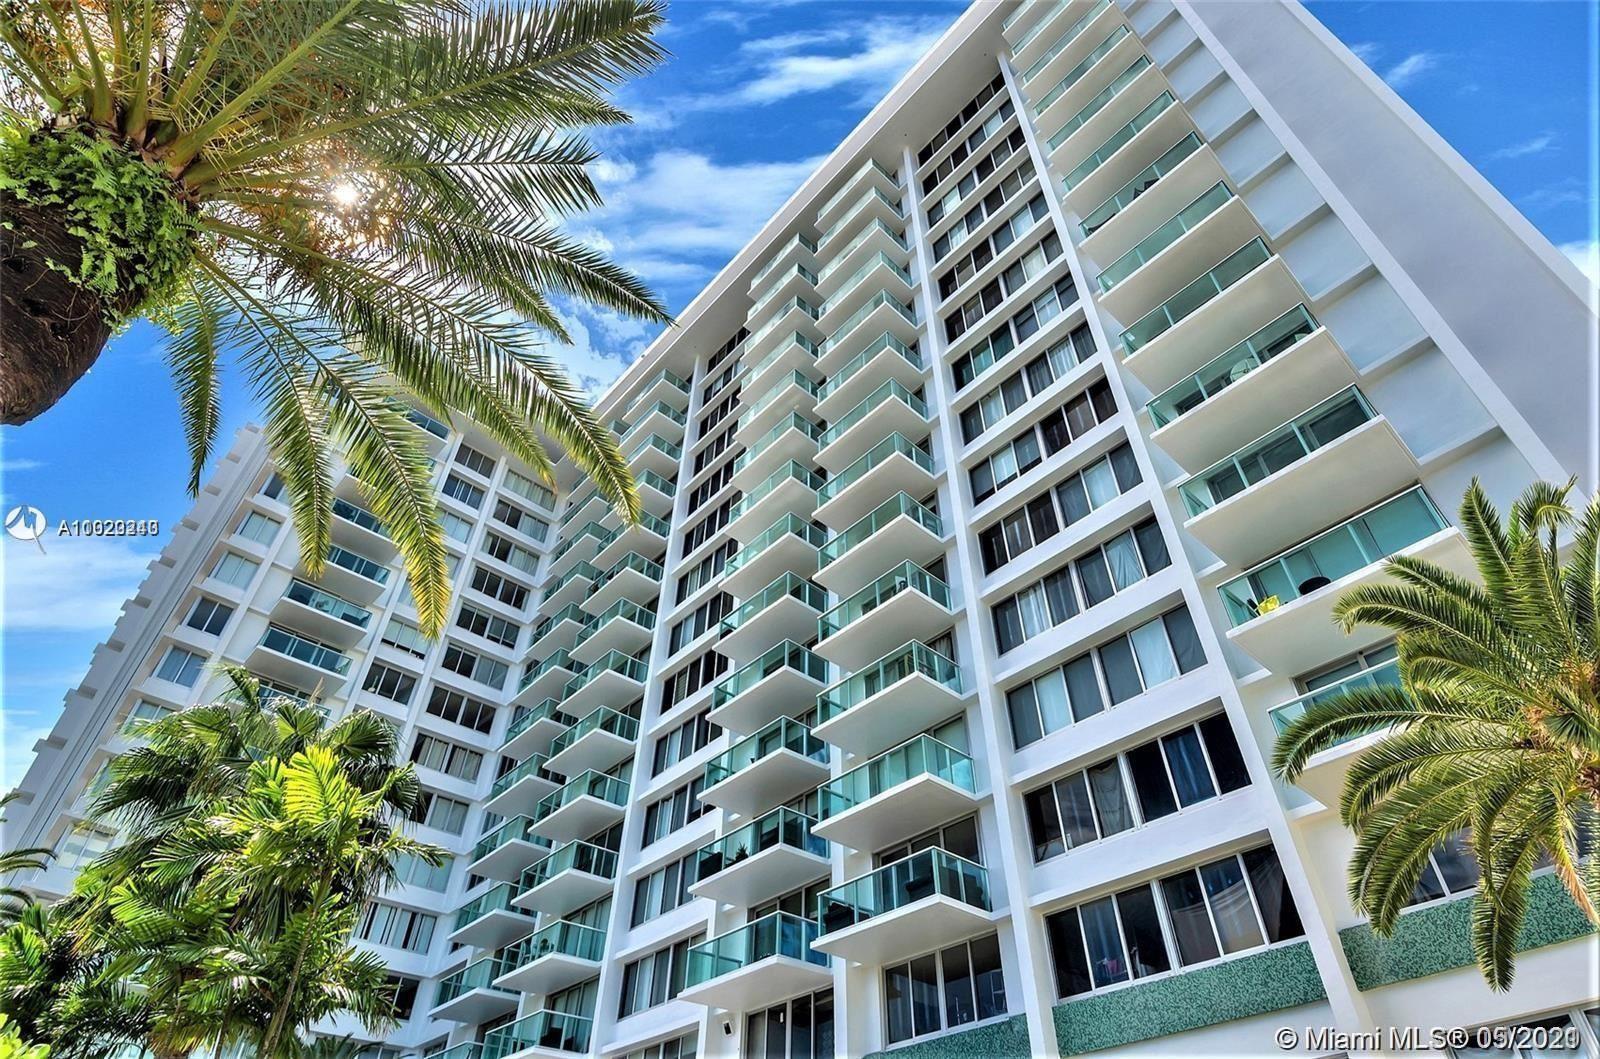 1000 West Ave #703, Miami Beach, FL 33139 - #: A11020240